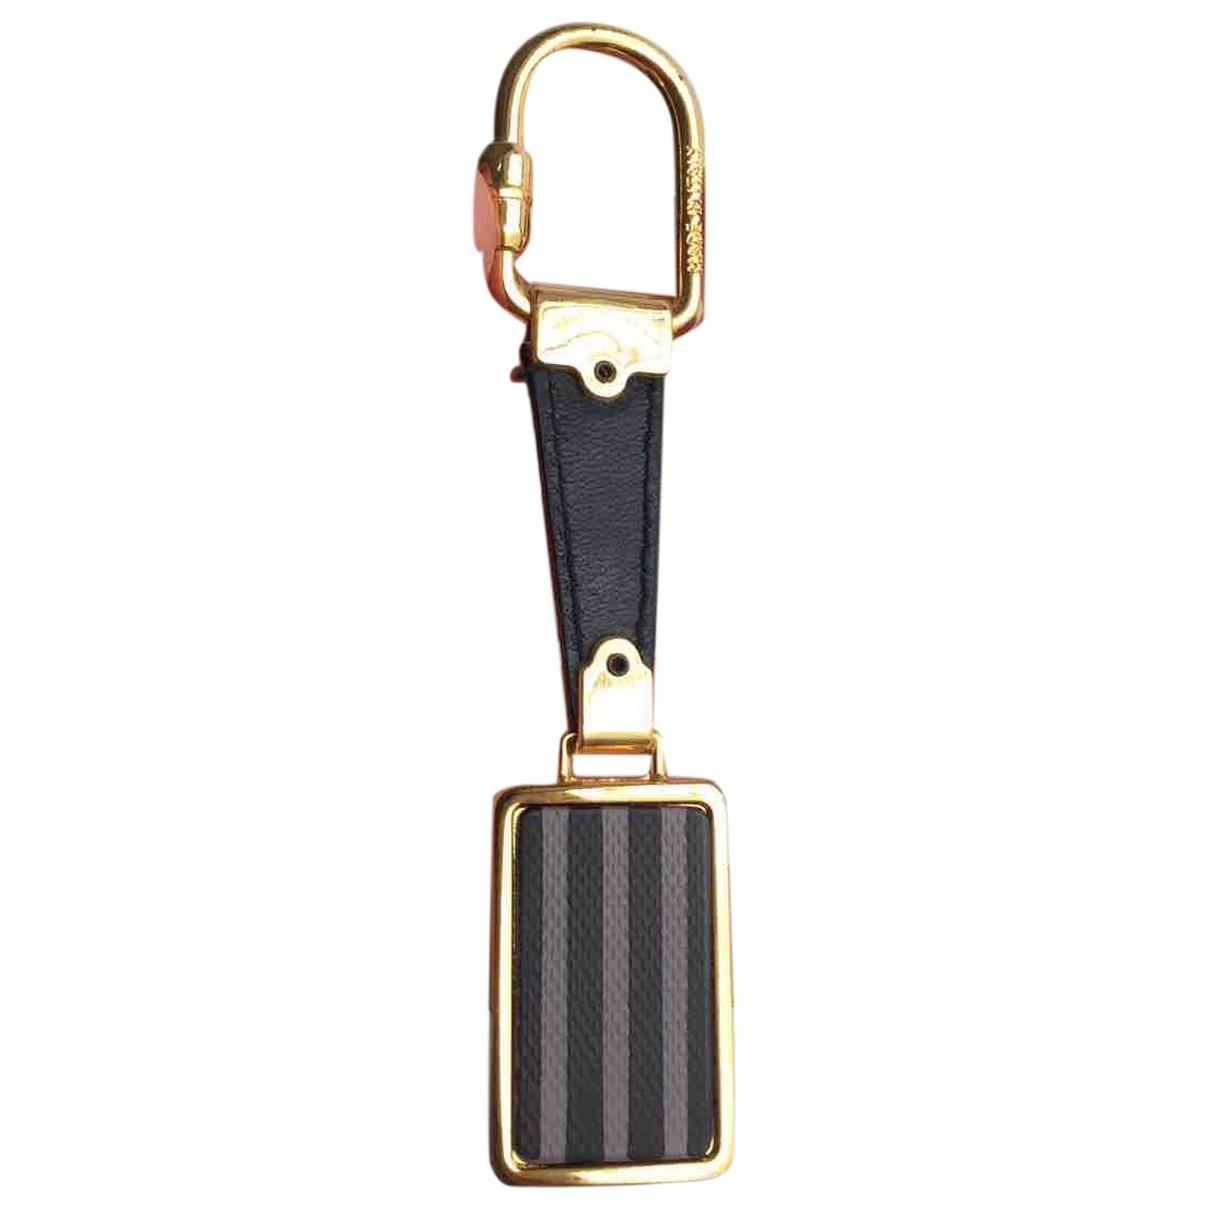 Fendi N Gold Leather Purses, wallet & cases for Women N